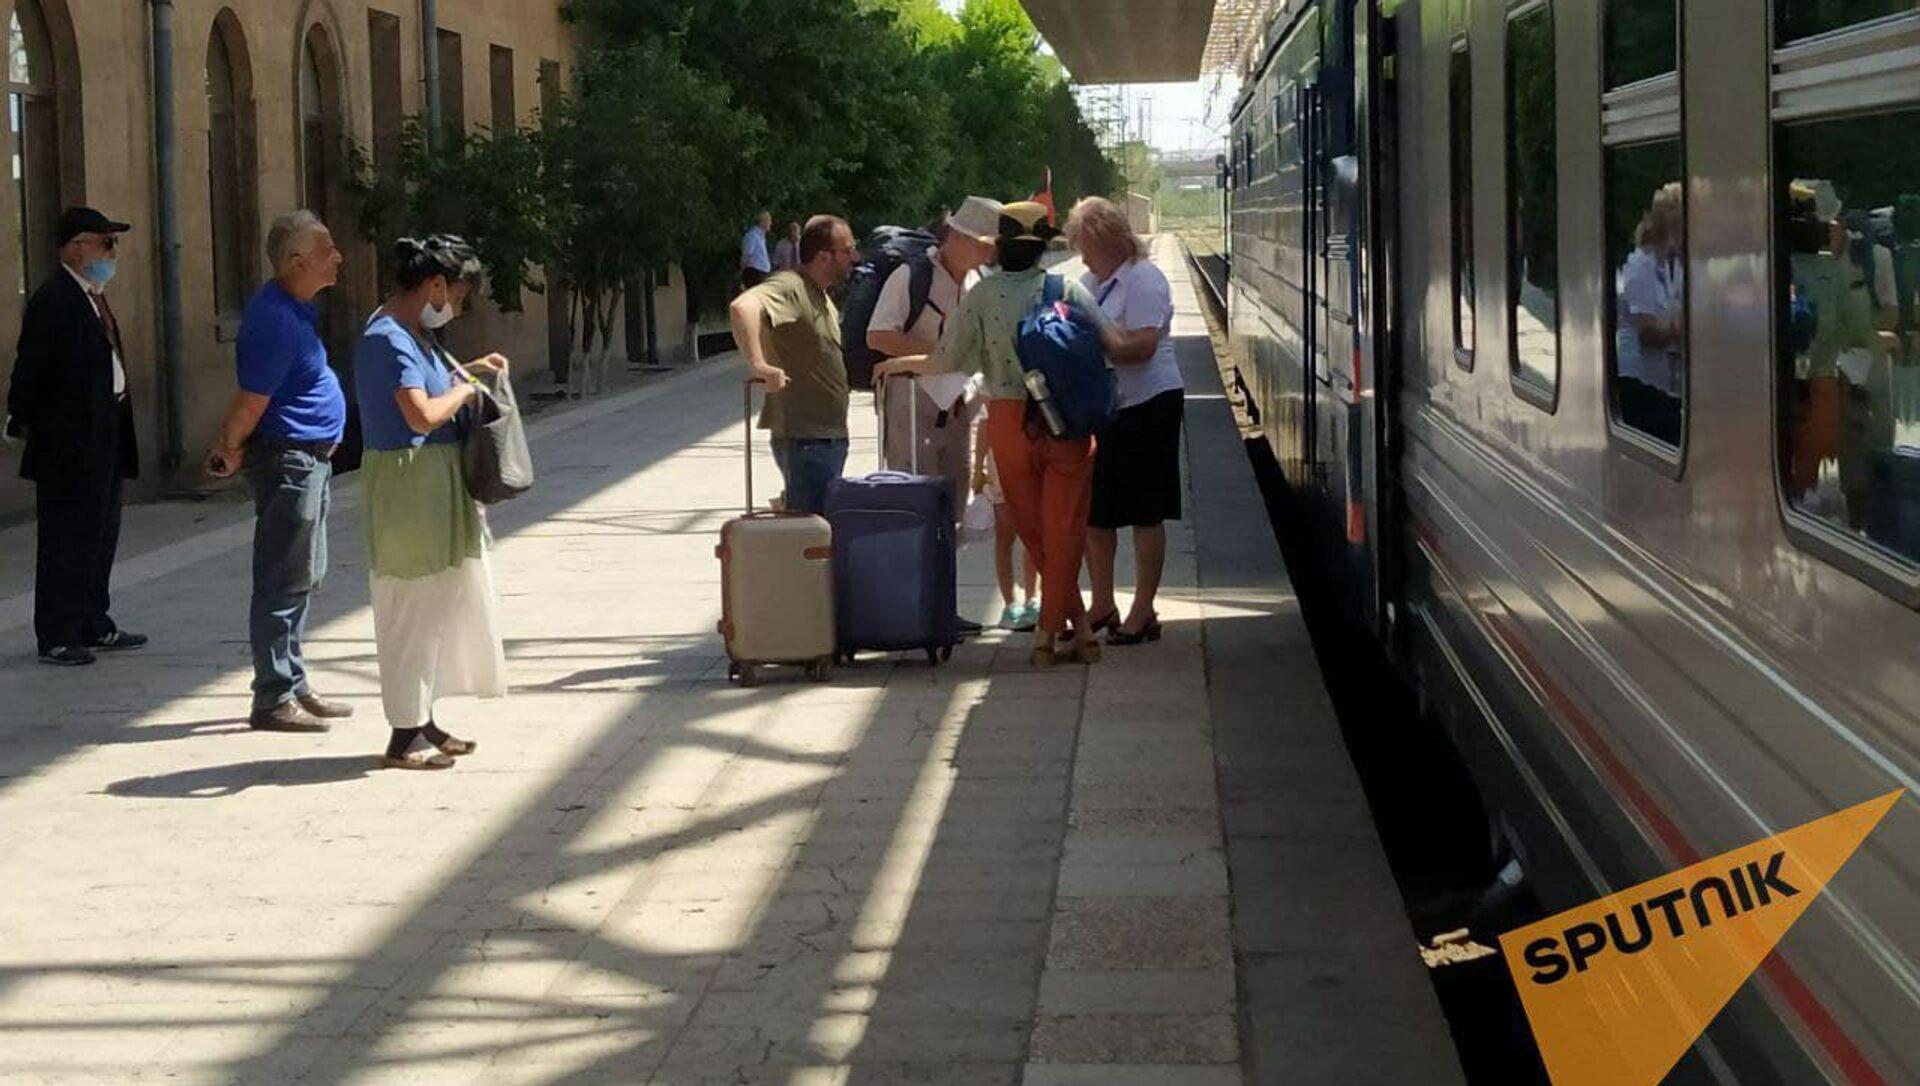 Пассажиры на перроне у поезда Ереван - Батуми - Sputnik Արմենիա, 1920, 05.07.2021